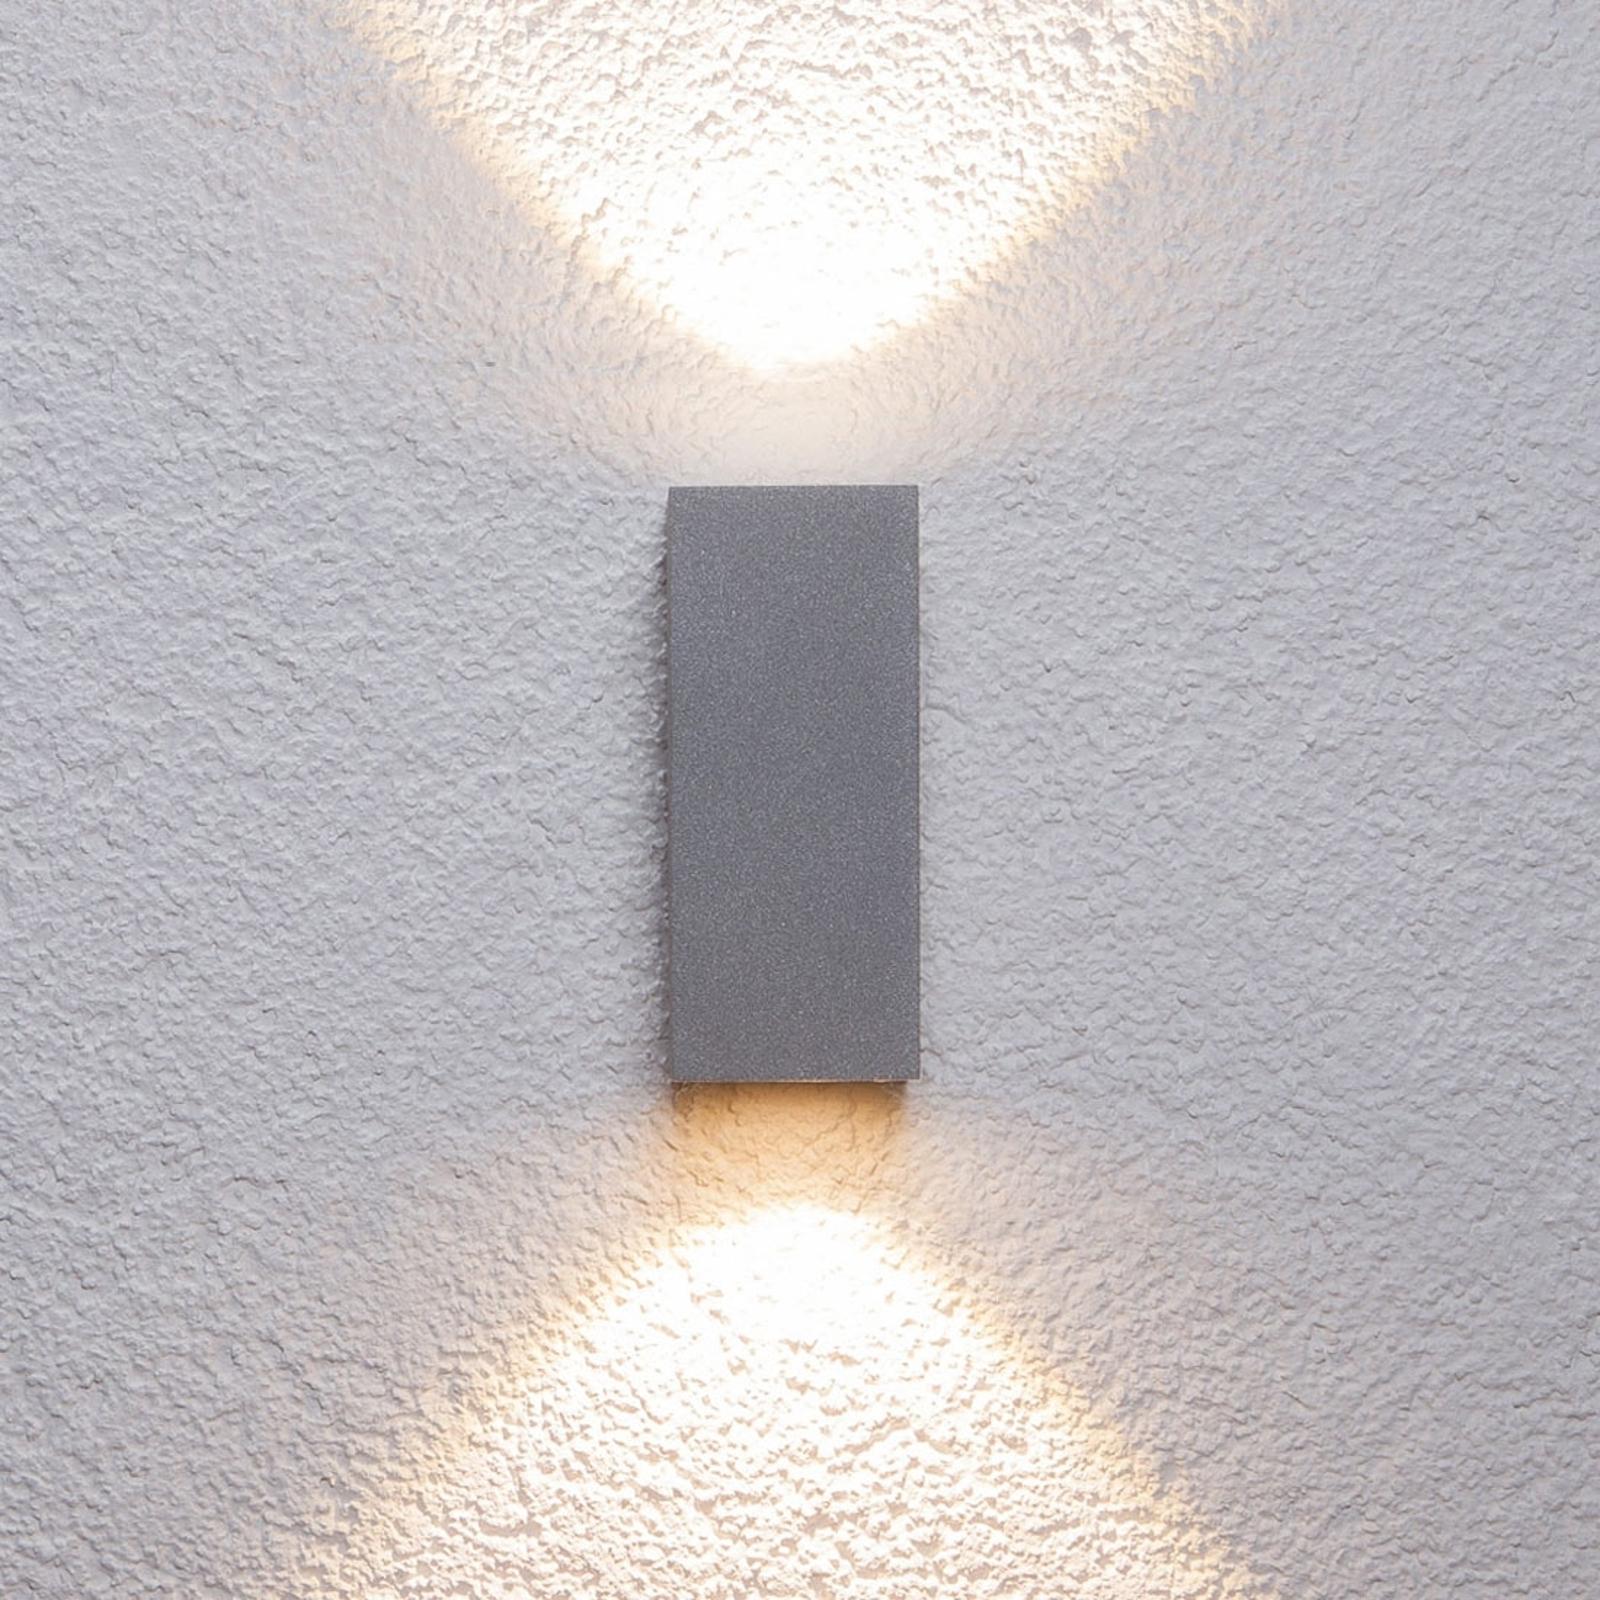 Zilveren buitenwandlamp Tavi m. Bridgelux-LED